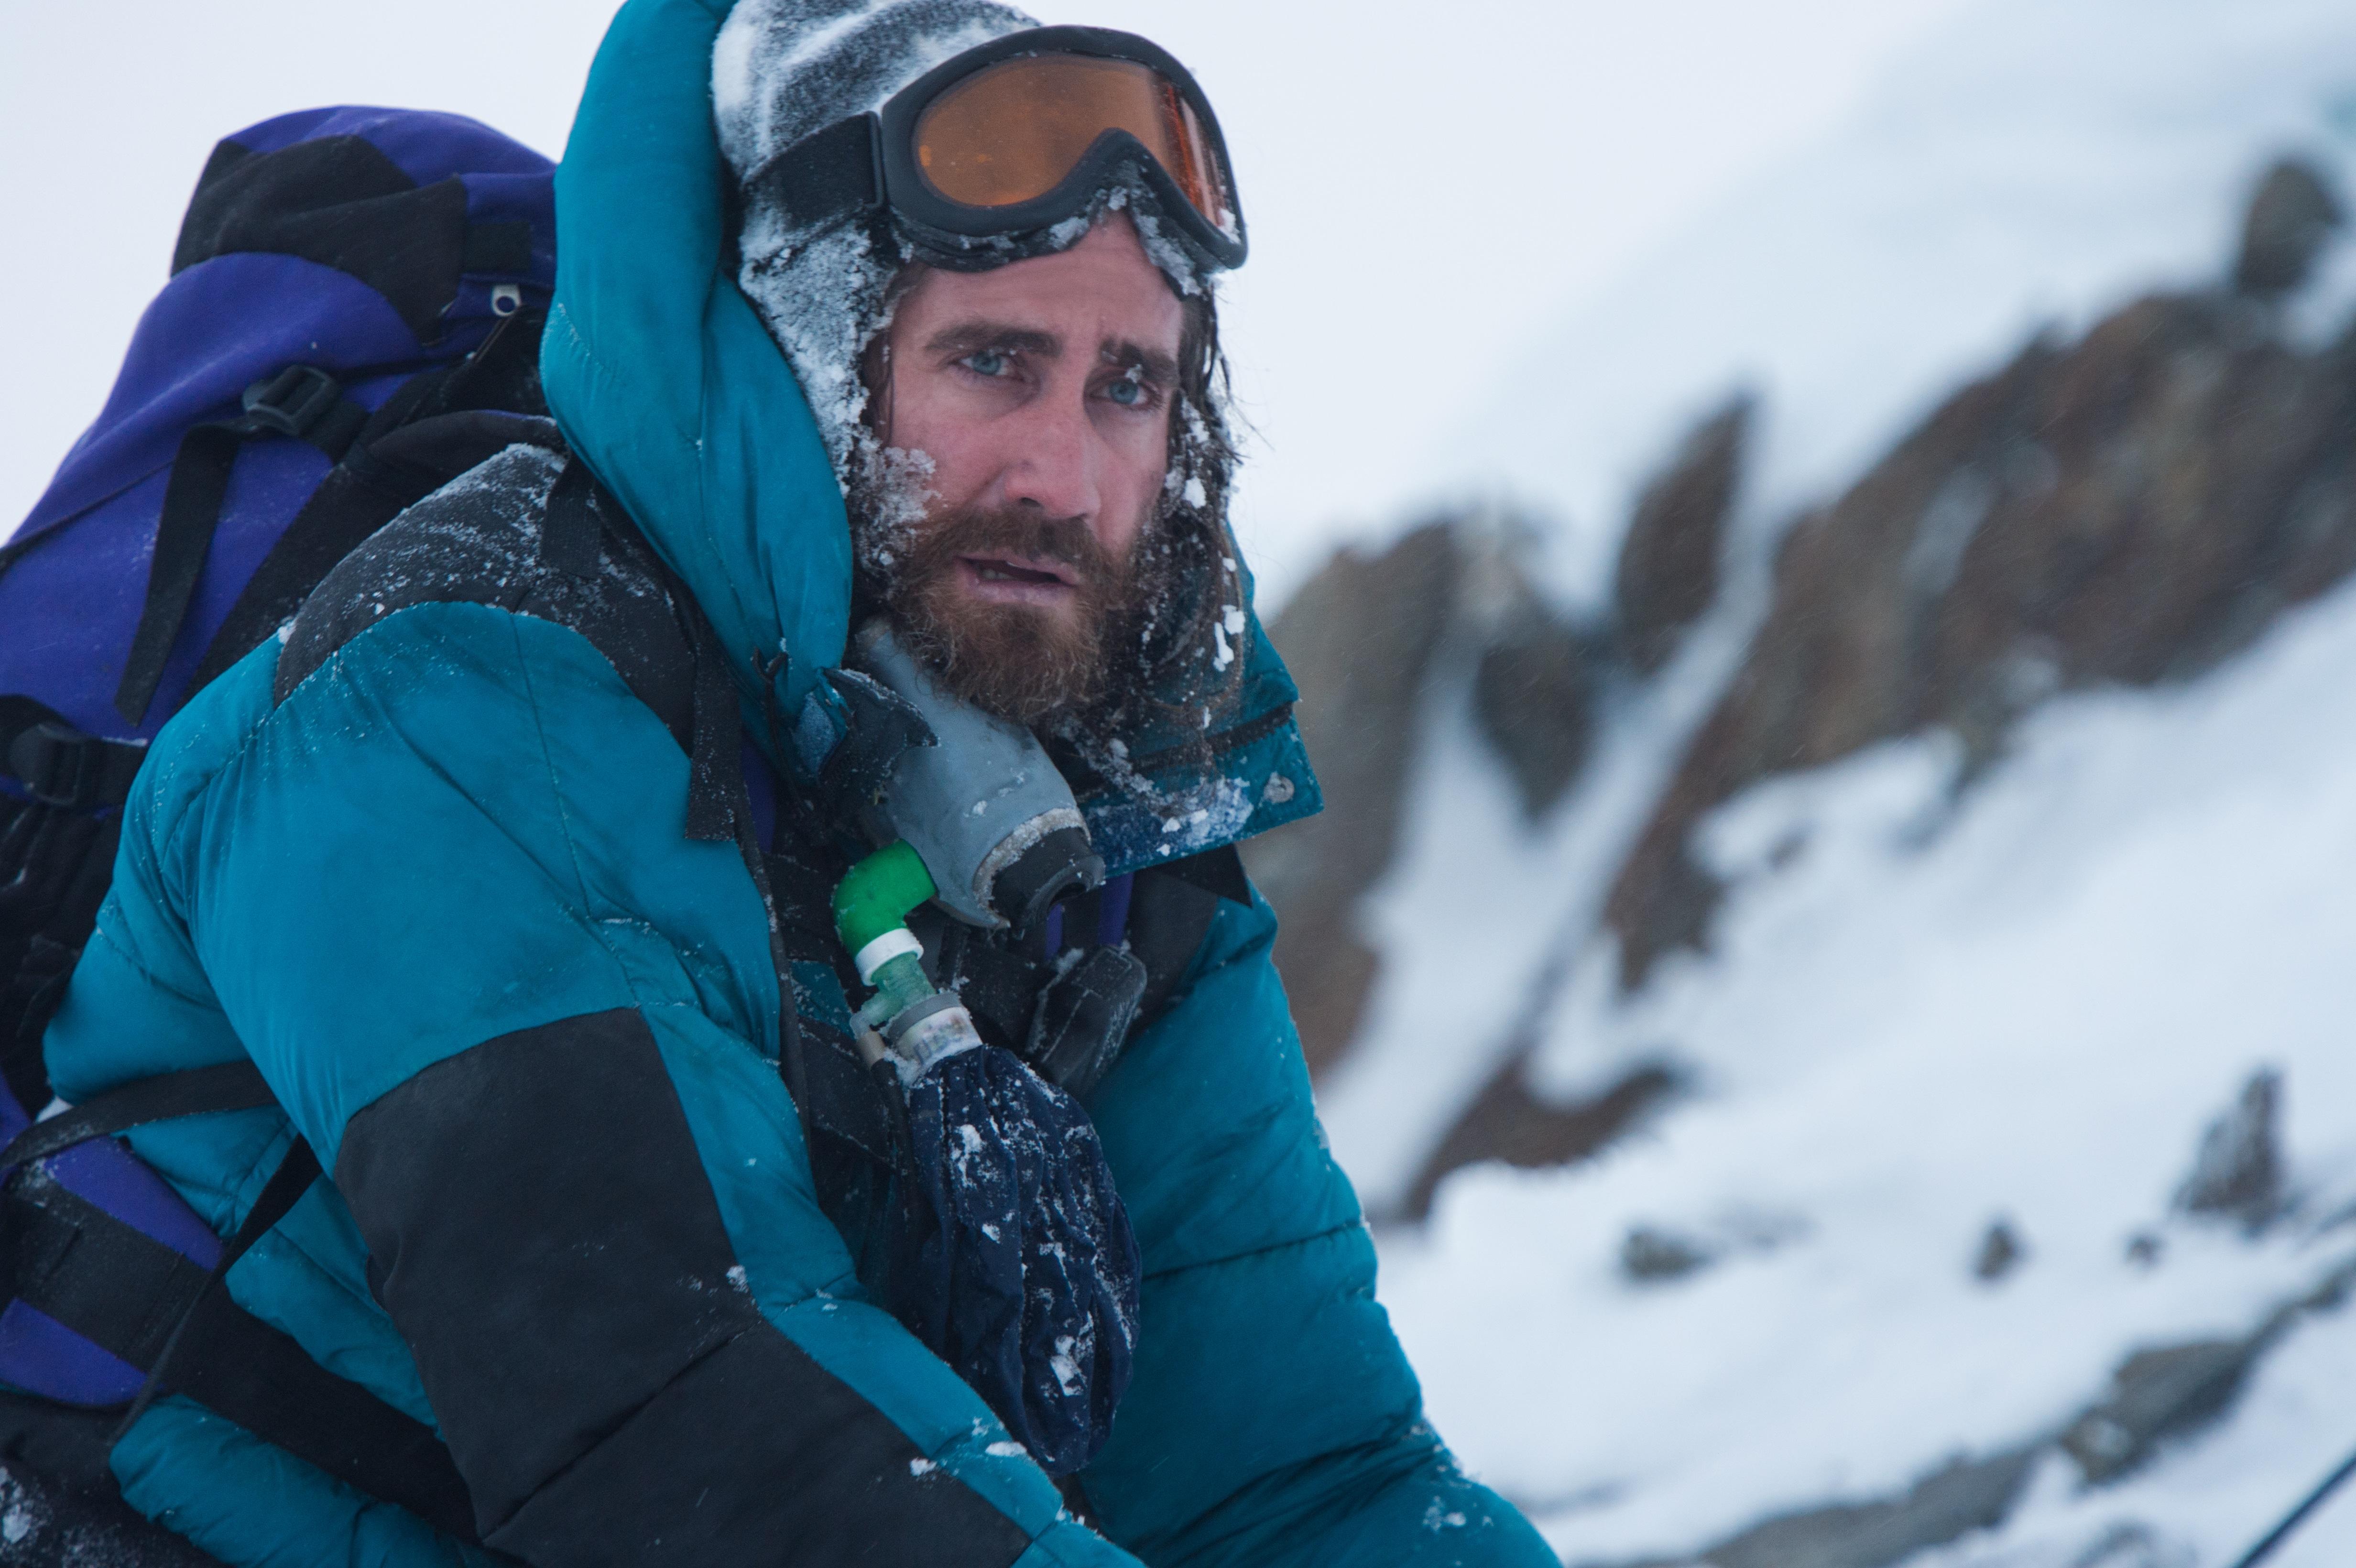 Kino Everest